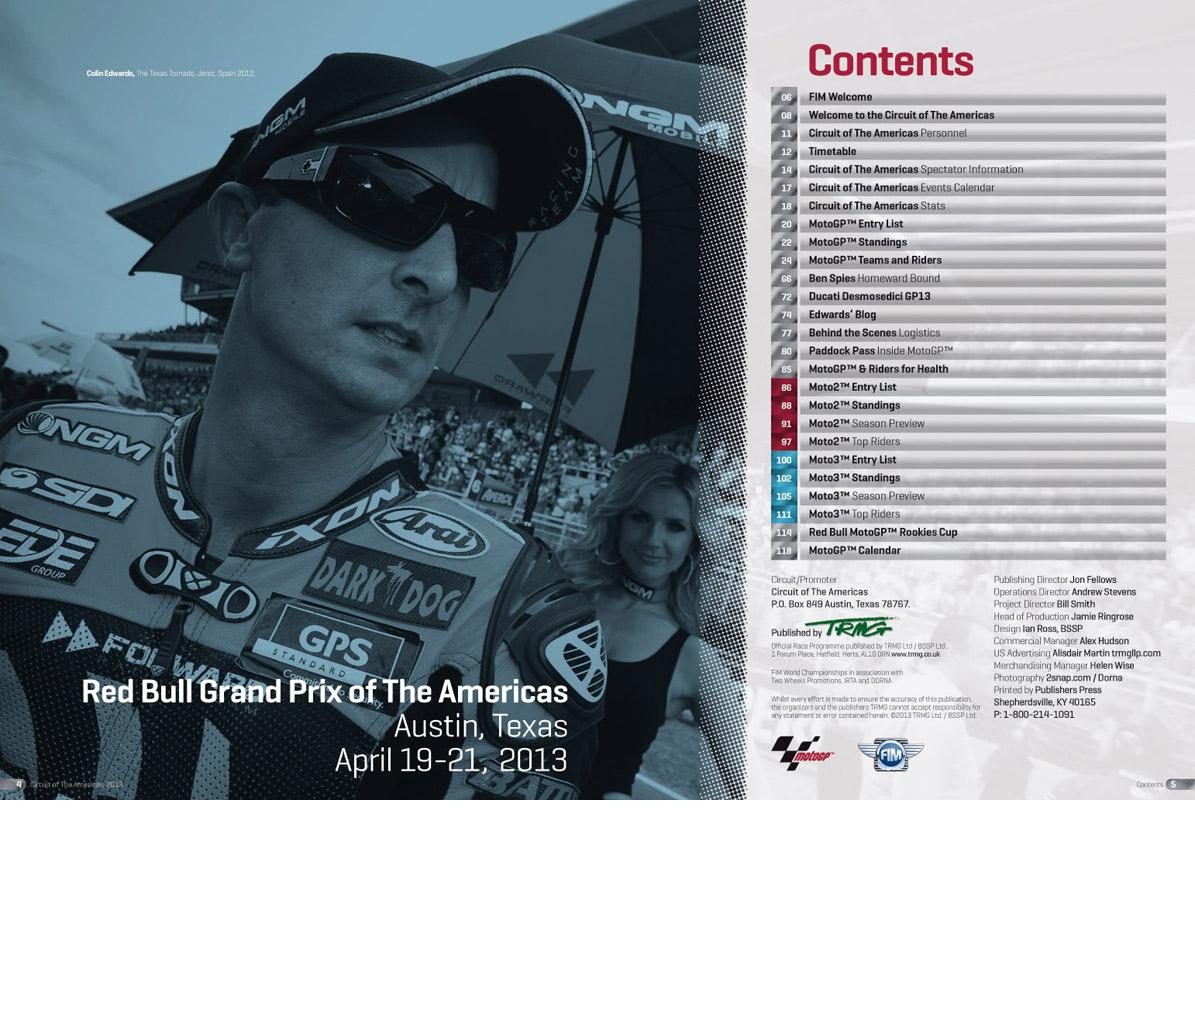 MotoGPTexas2013_Contents